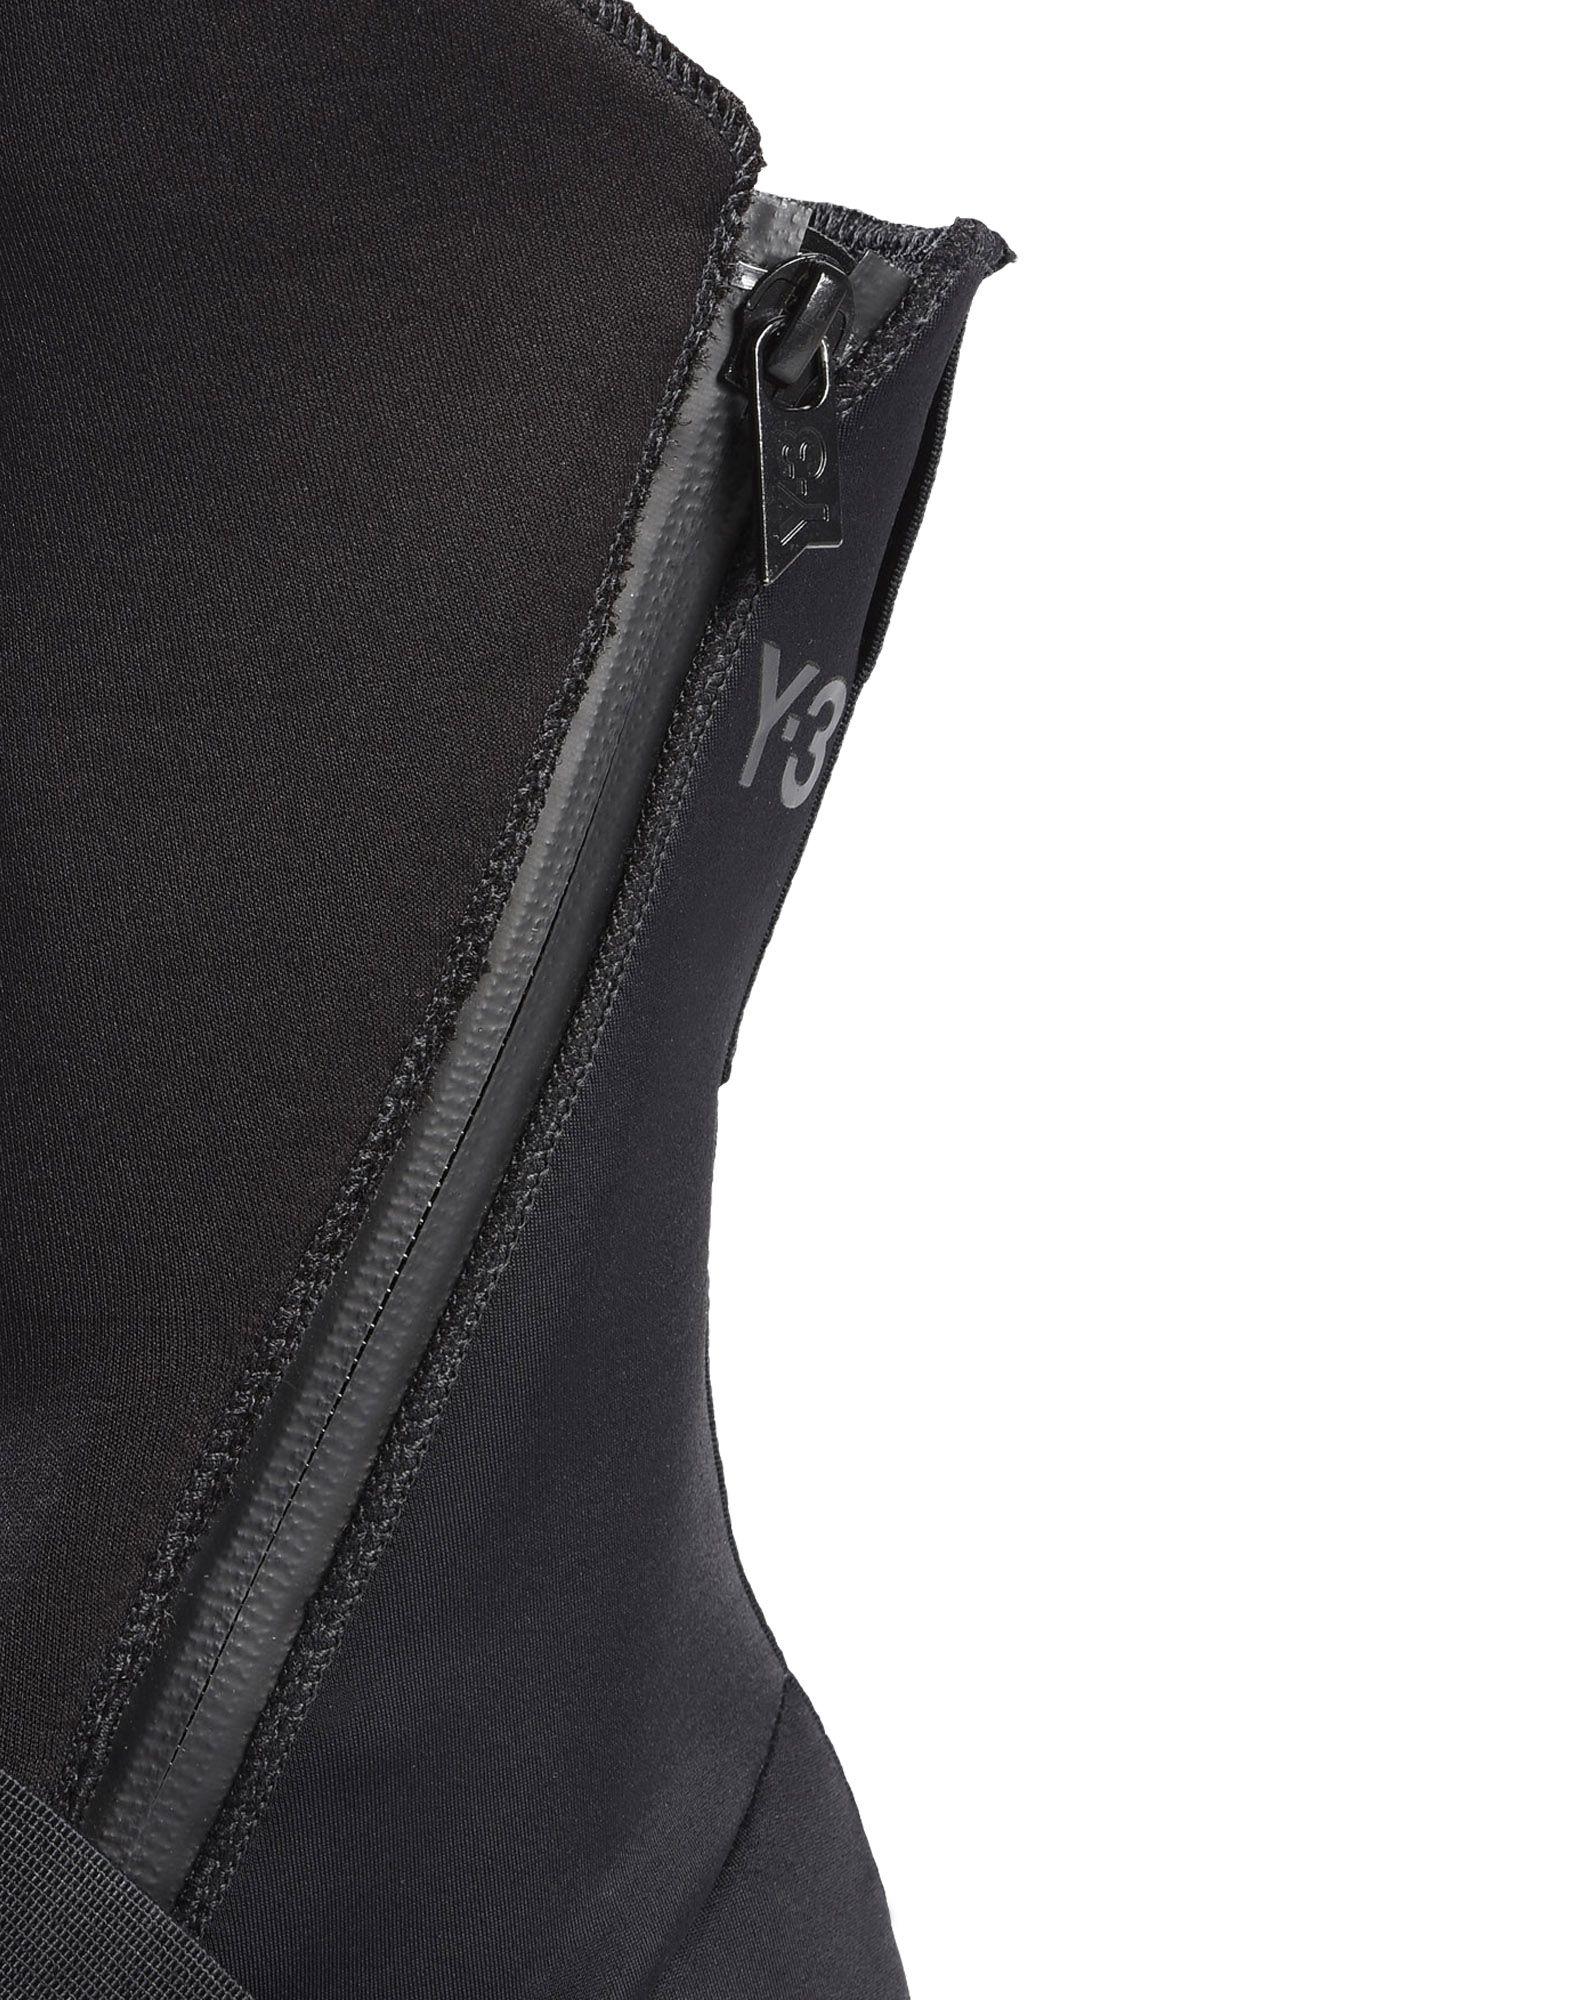 Y-3 Y-3 QASA BOOT High-top sneakers Woman a ... a58f14cb16